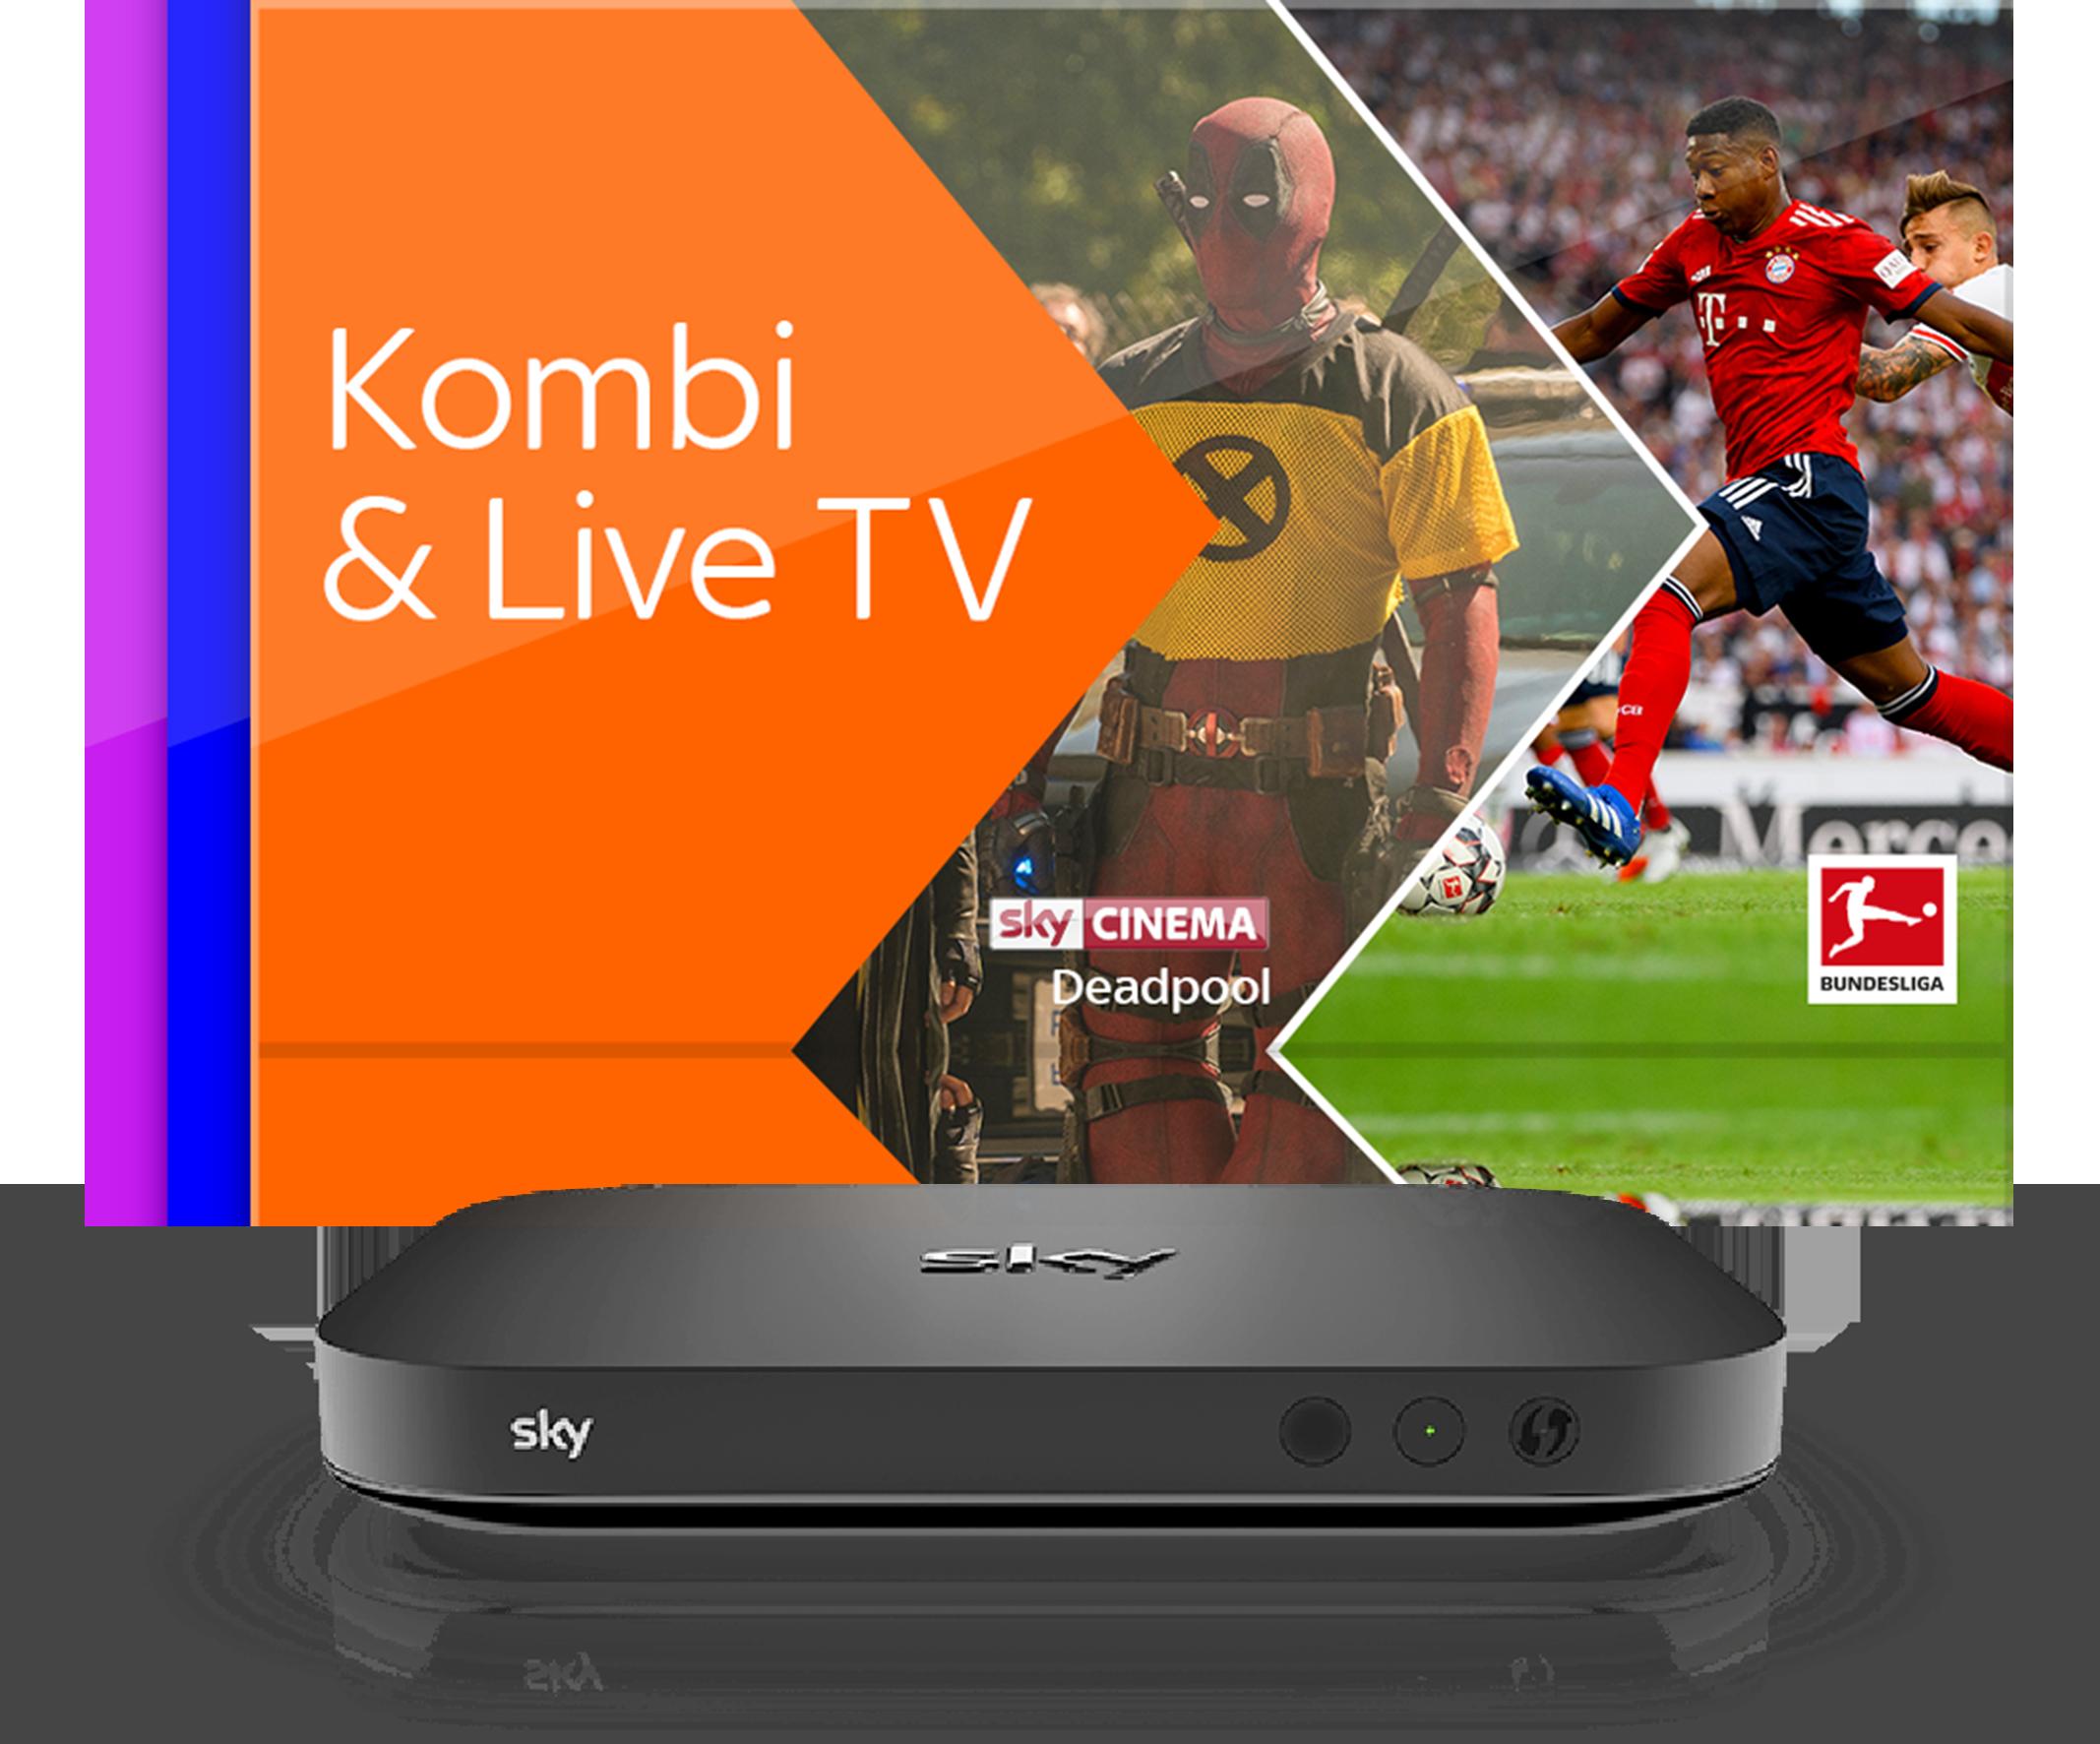 Kombi & Live TV und Sky X Streaming Box